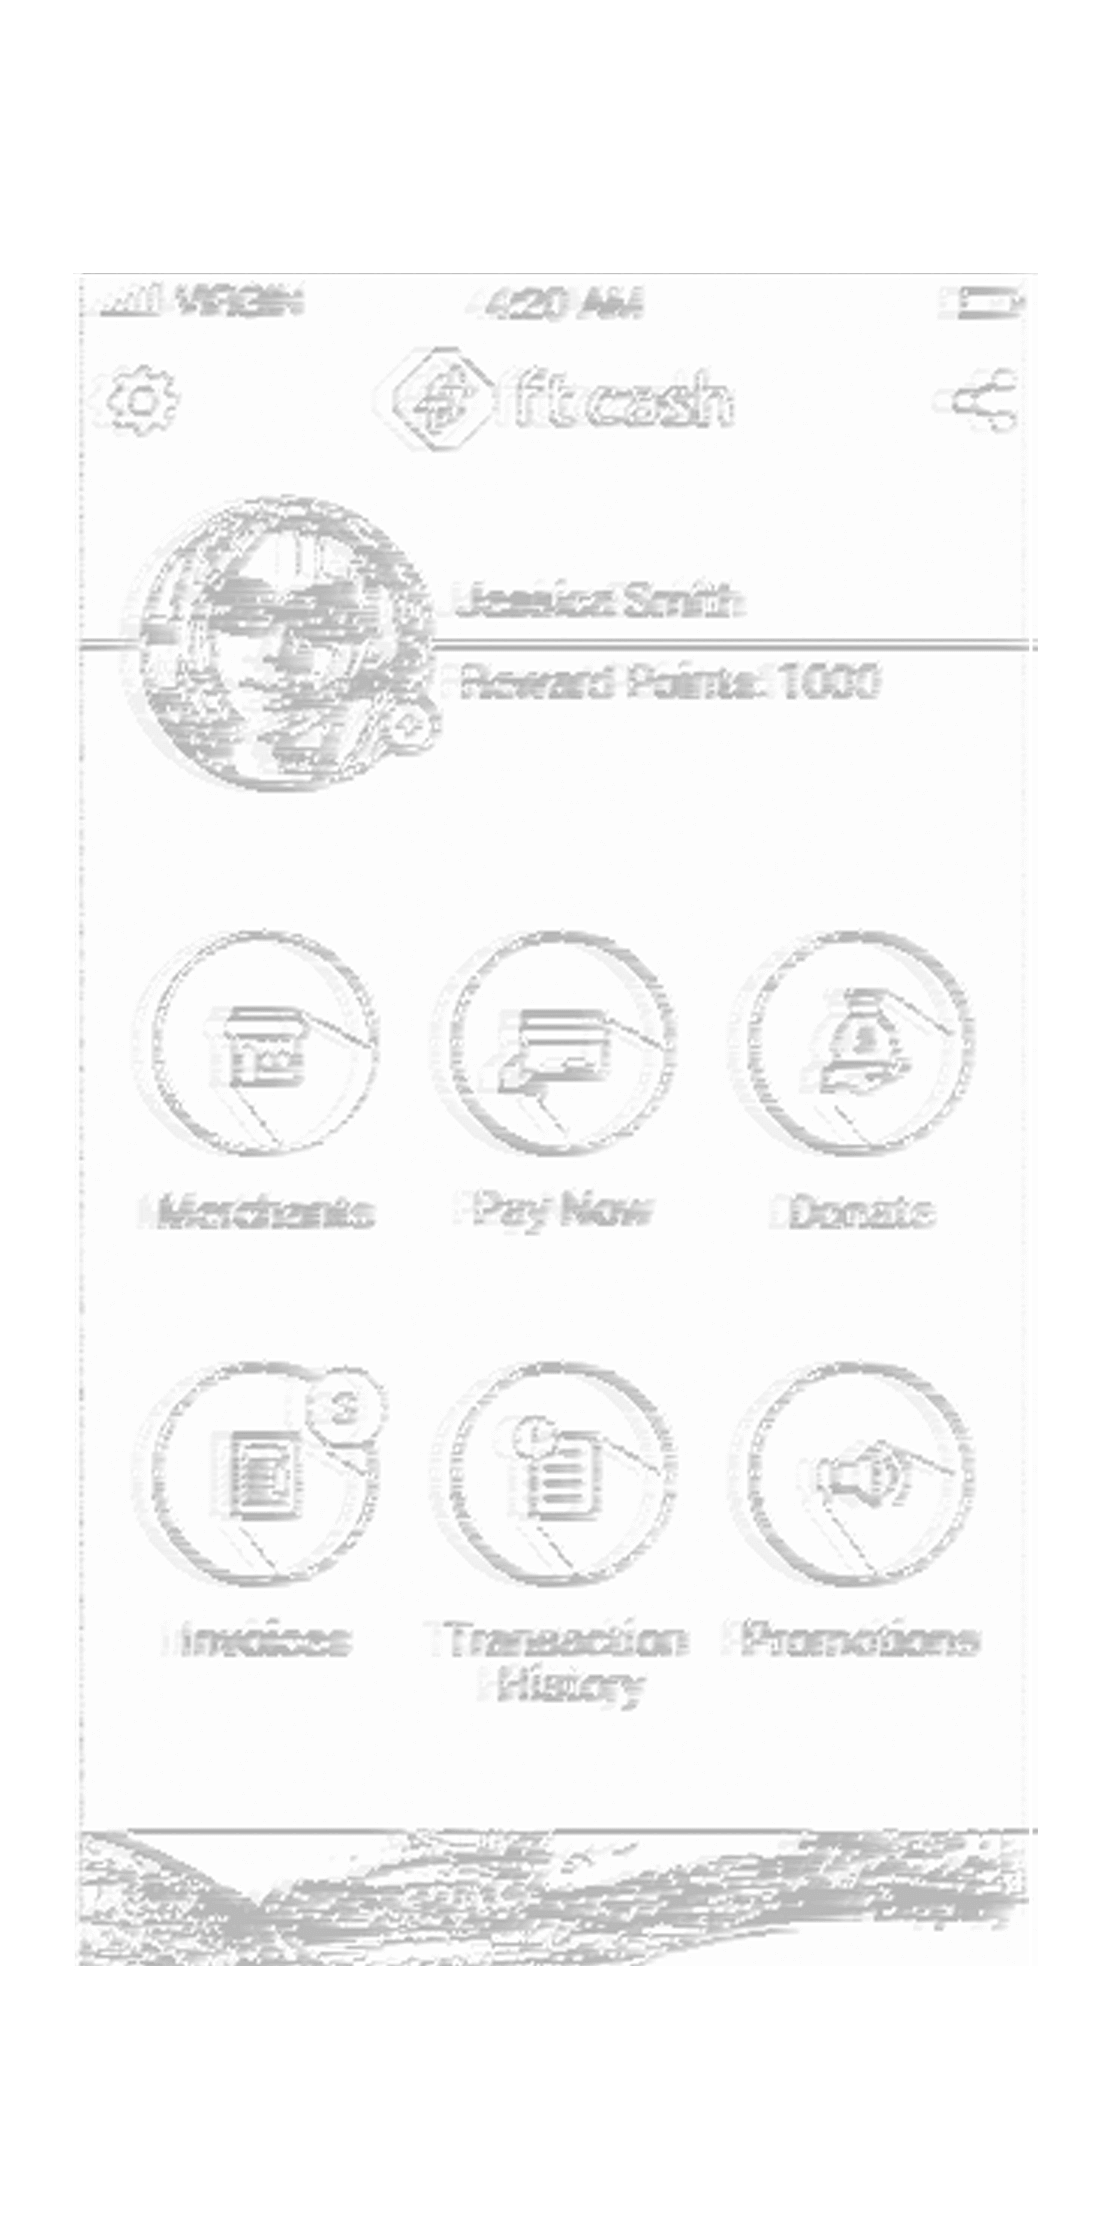 FTCash app wireframe